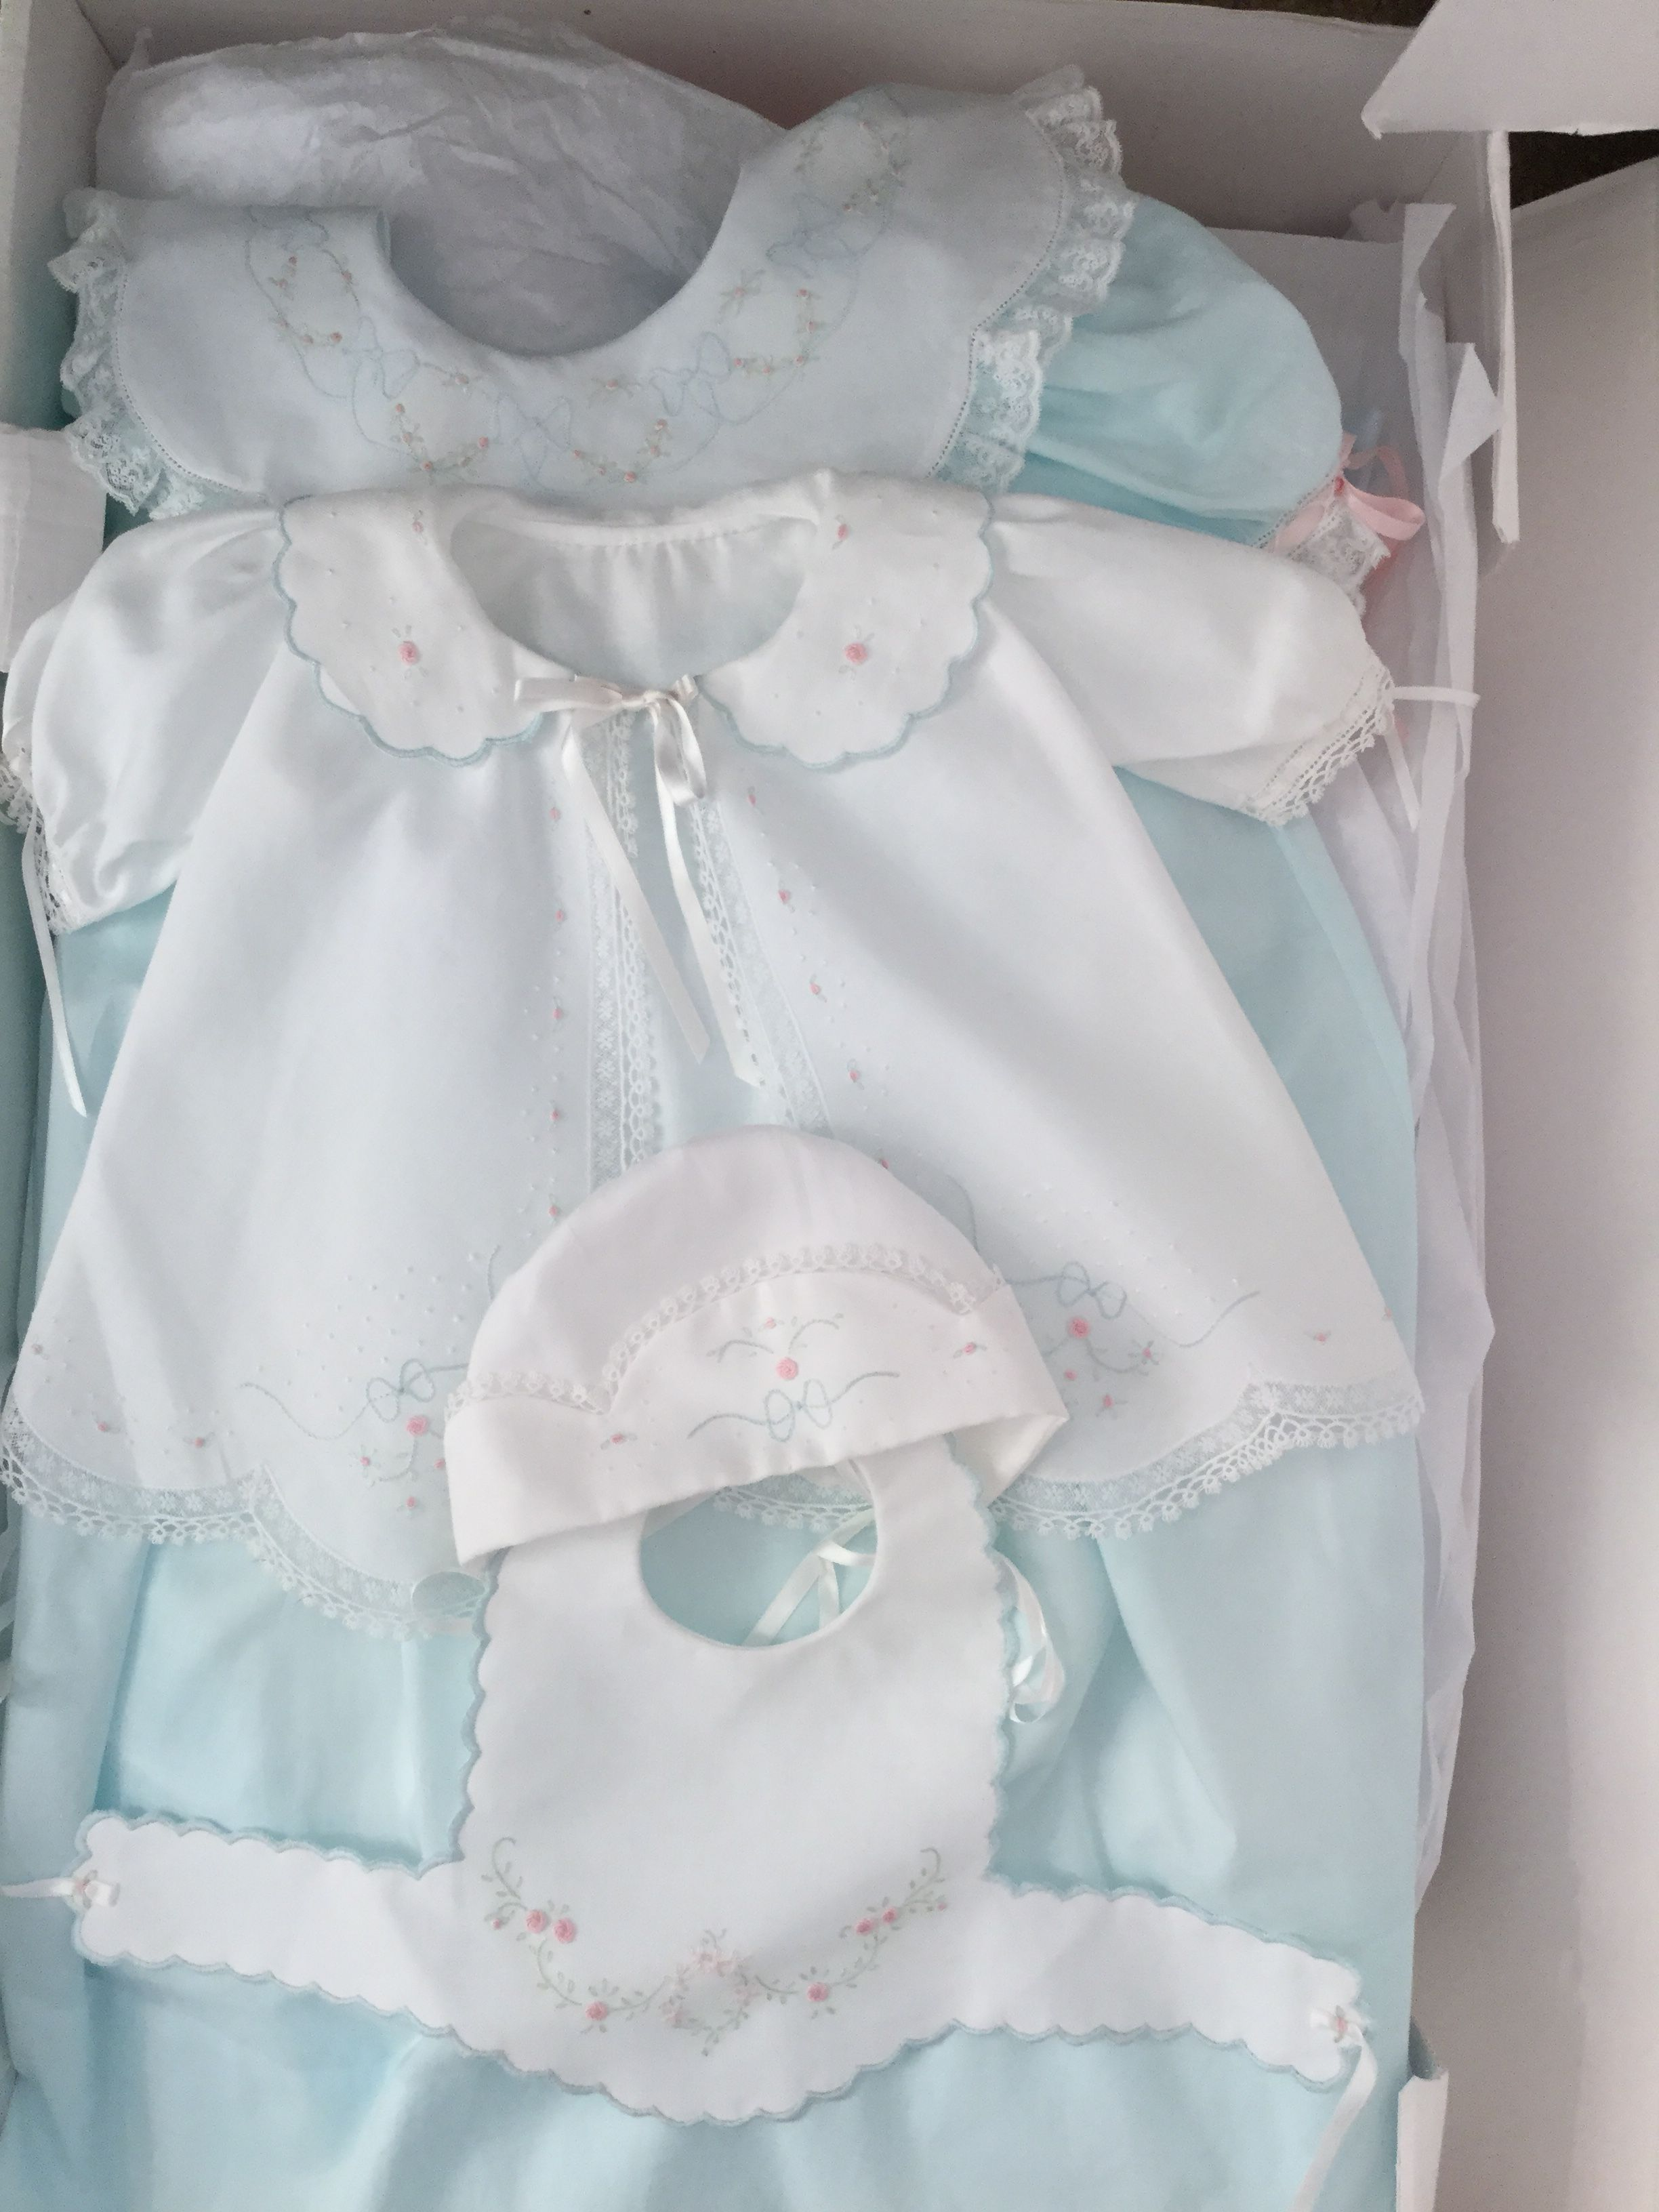 Pin de nancy silva en Bebé | Pinterest